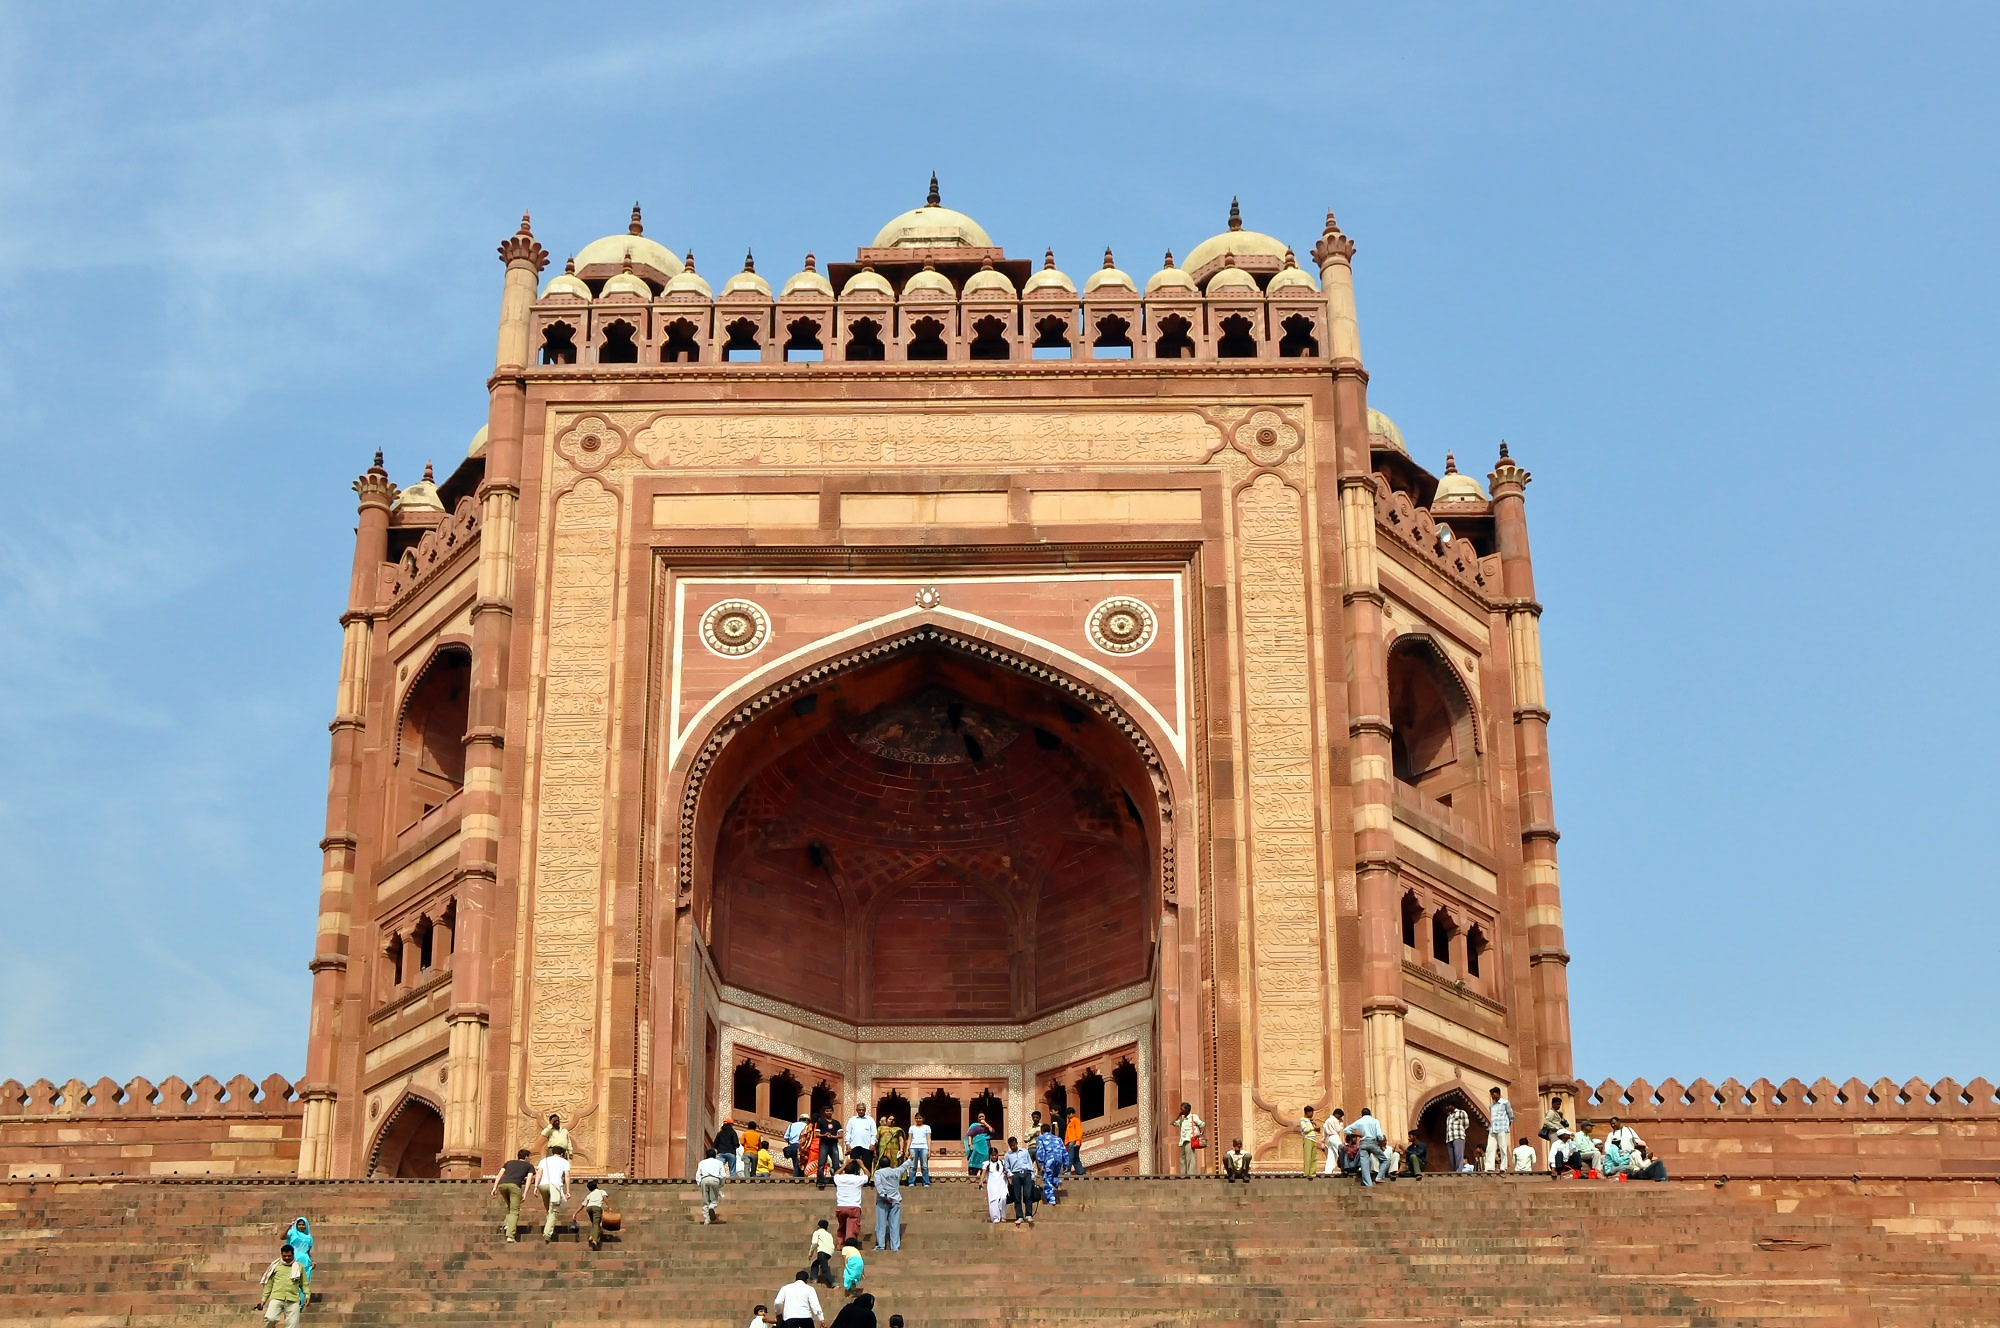 Buland Darwaza (Inside part of Fatehpur Sikri)